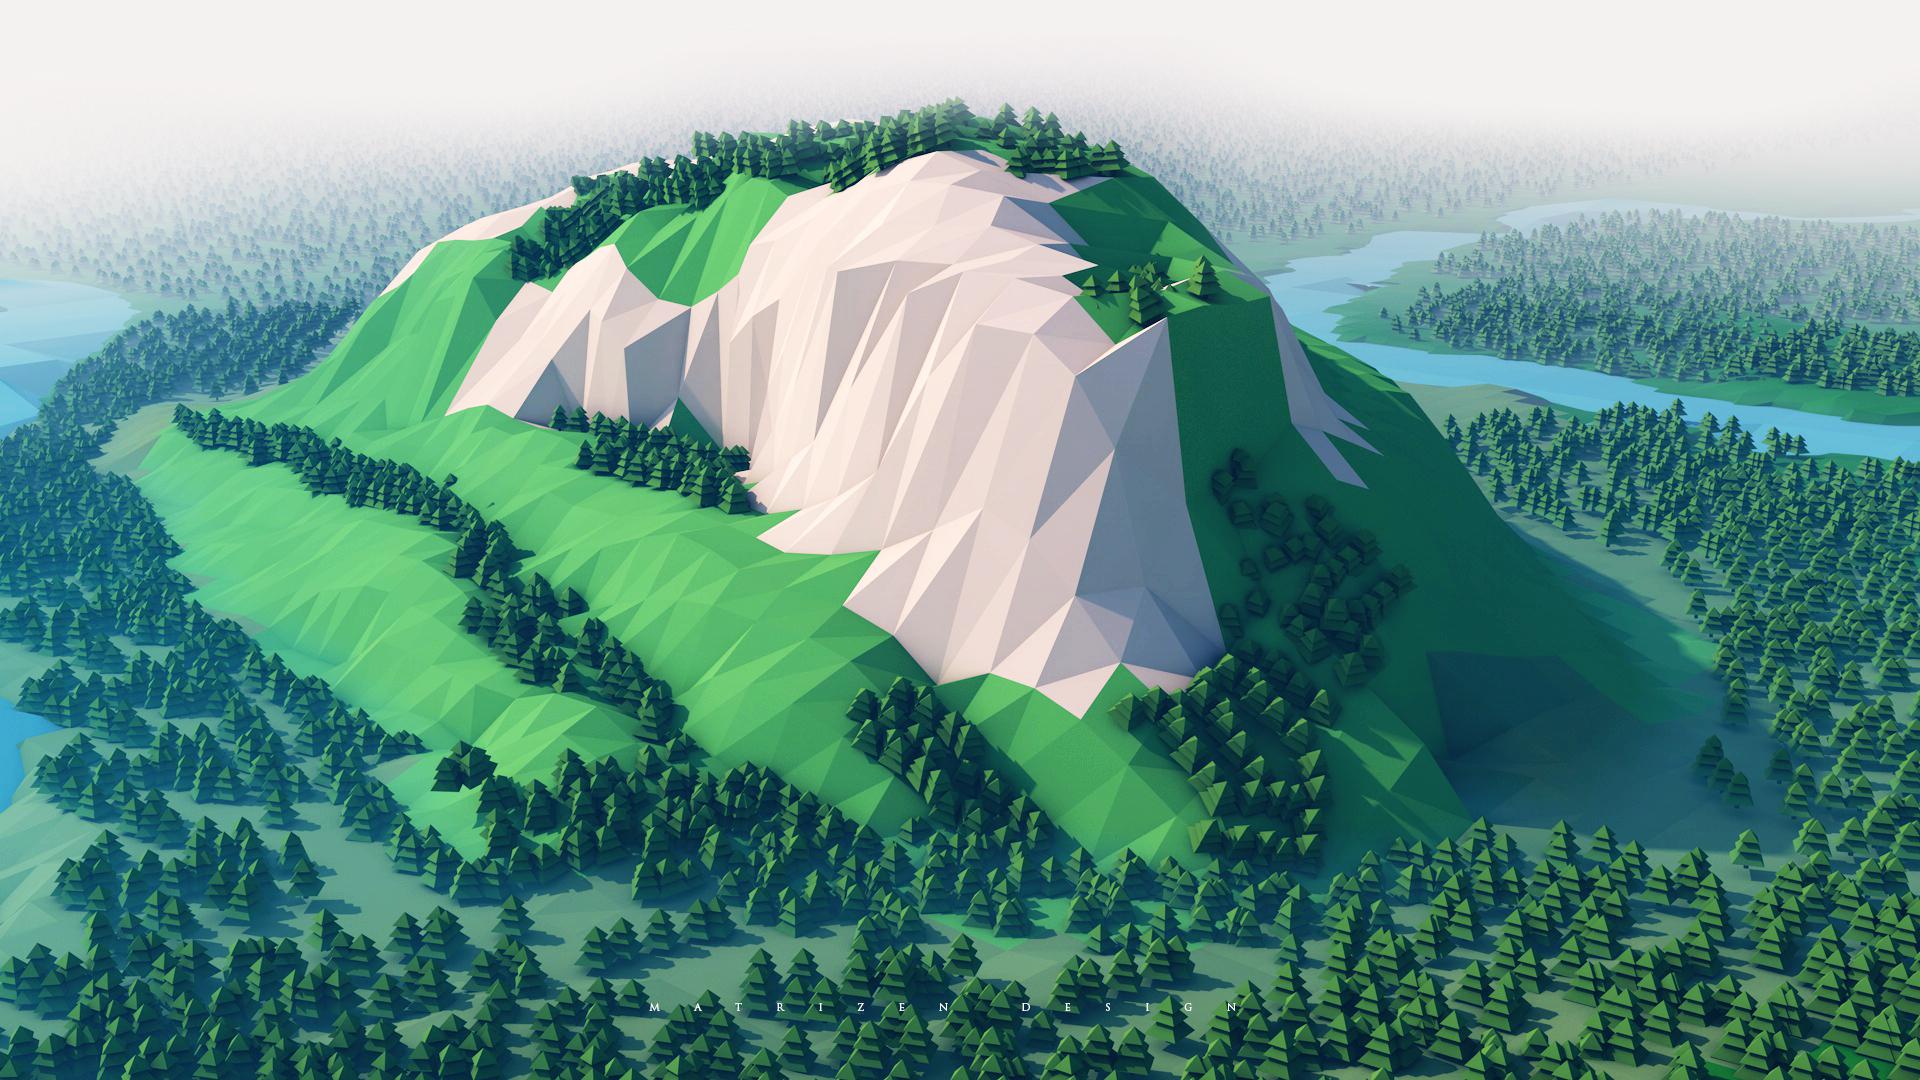 Minimalism Mountain Peak Full Hd Wallpaper: 1280x720 Mountains Trees Forest 3d Minimalism 720P HD 4k